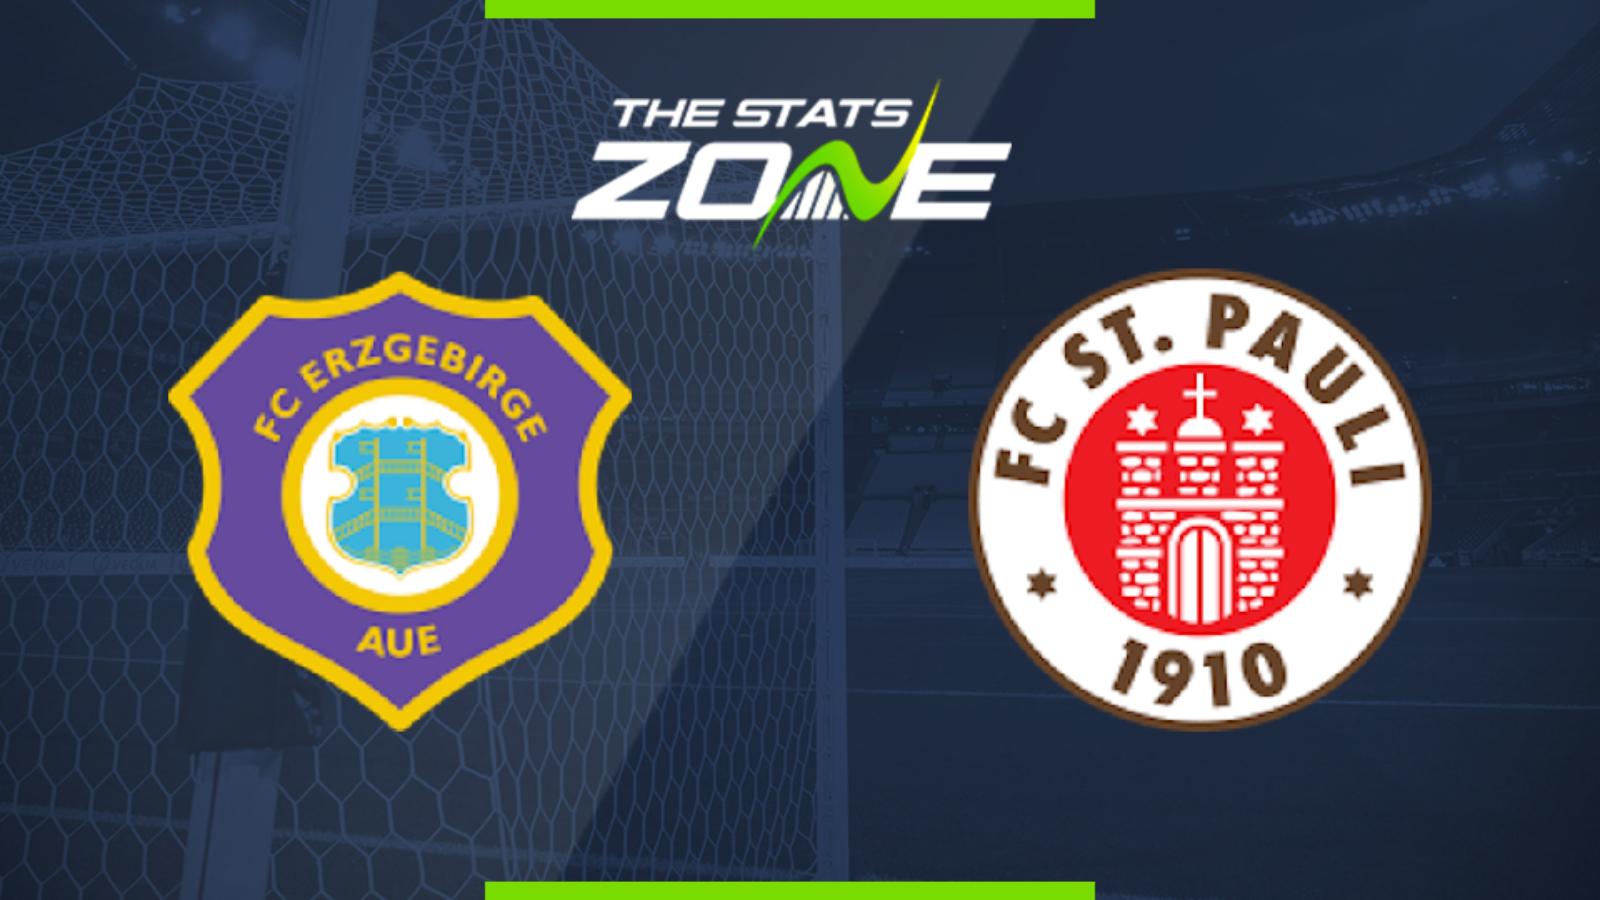 2019 20 Bundesliga 2 Erzgebirge Aue Vs St Pauli Preview